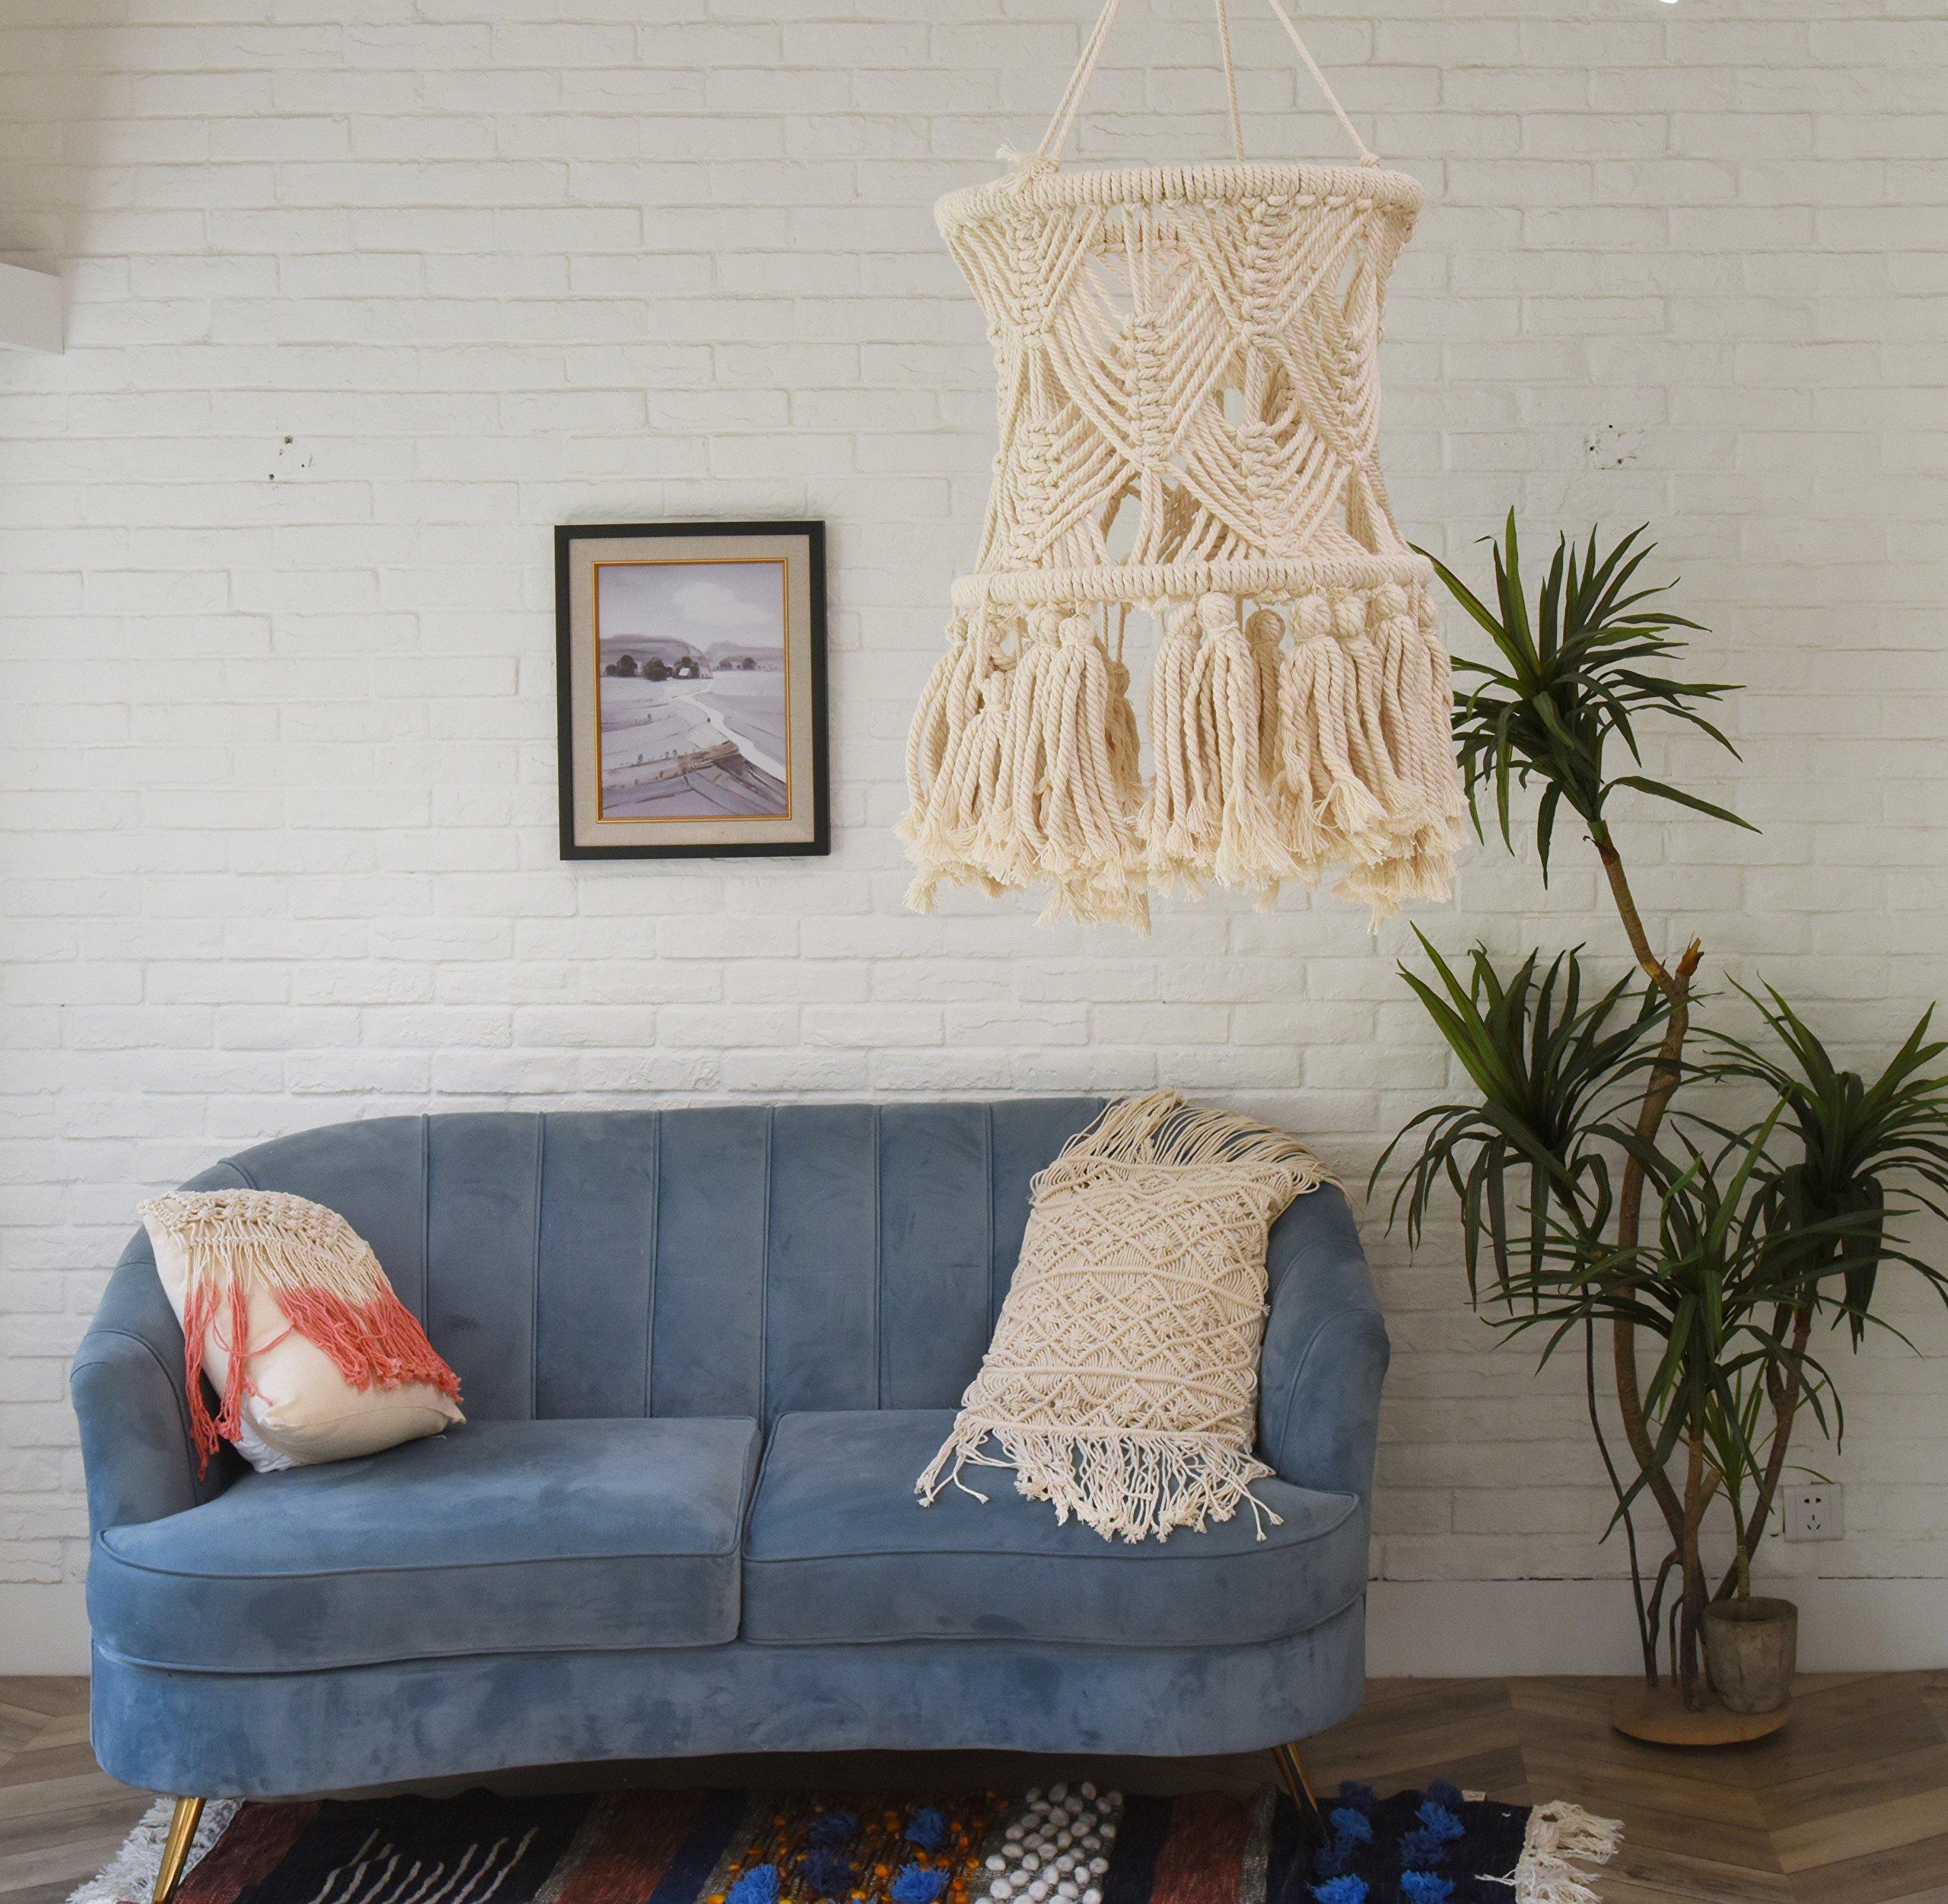 Flber Macrame LampShade Tasseled Chandelier Boho Wedding Hanging Handwoven Home Decoration,11'' Wx 20'' L